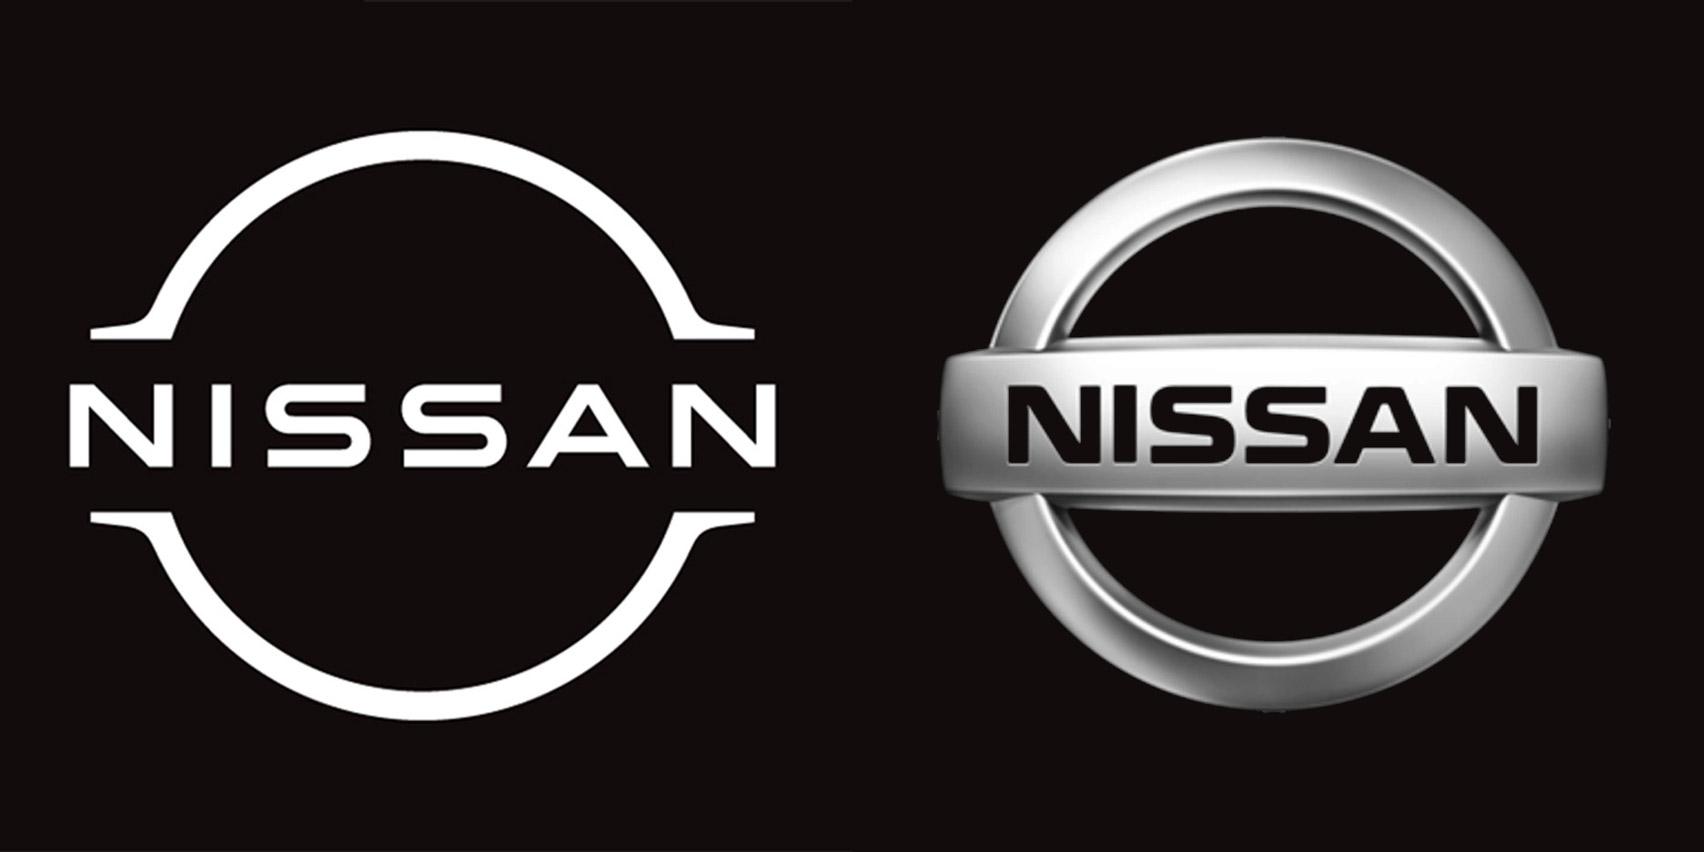 Nissan flat logo